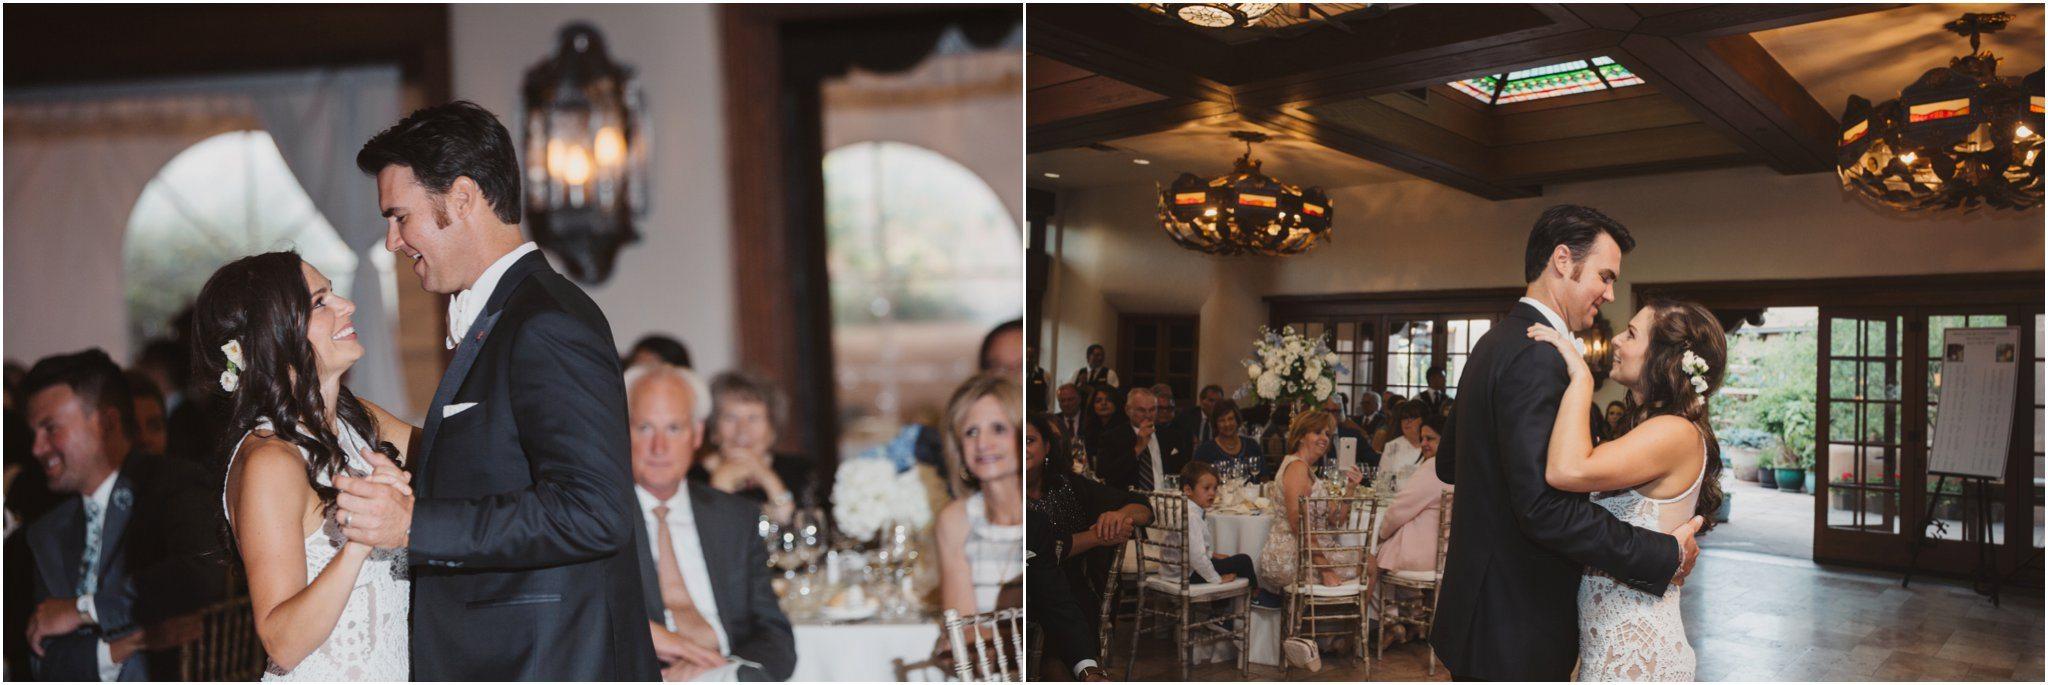 0066santa-fe-wedding-photographer_albuquerque-wedding-photographer_-southwest-wedding-photography_-blue-rose-studio